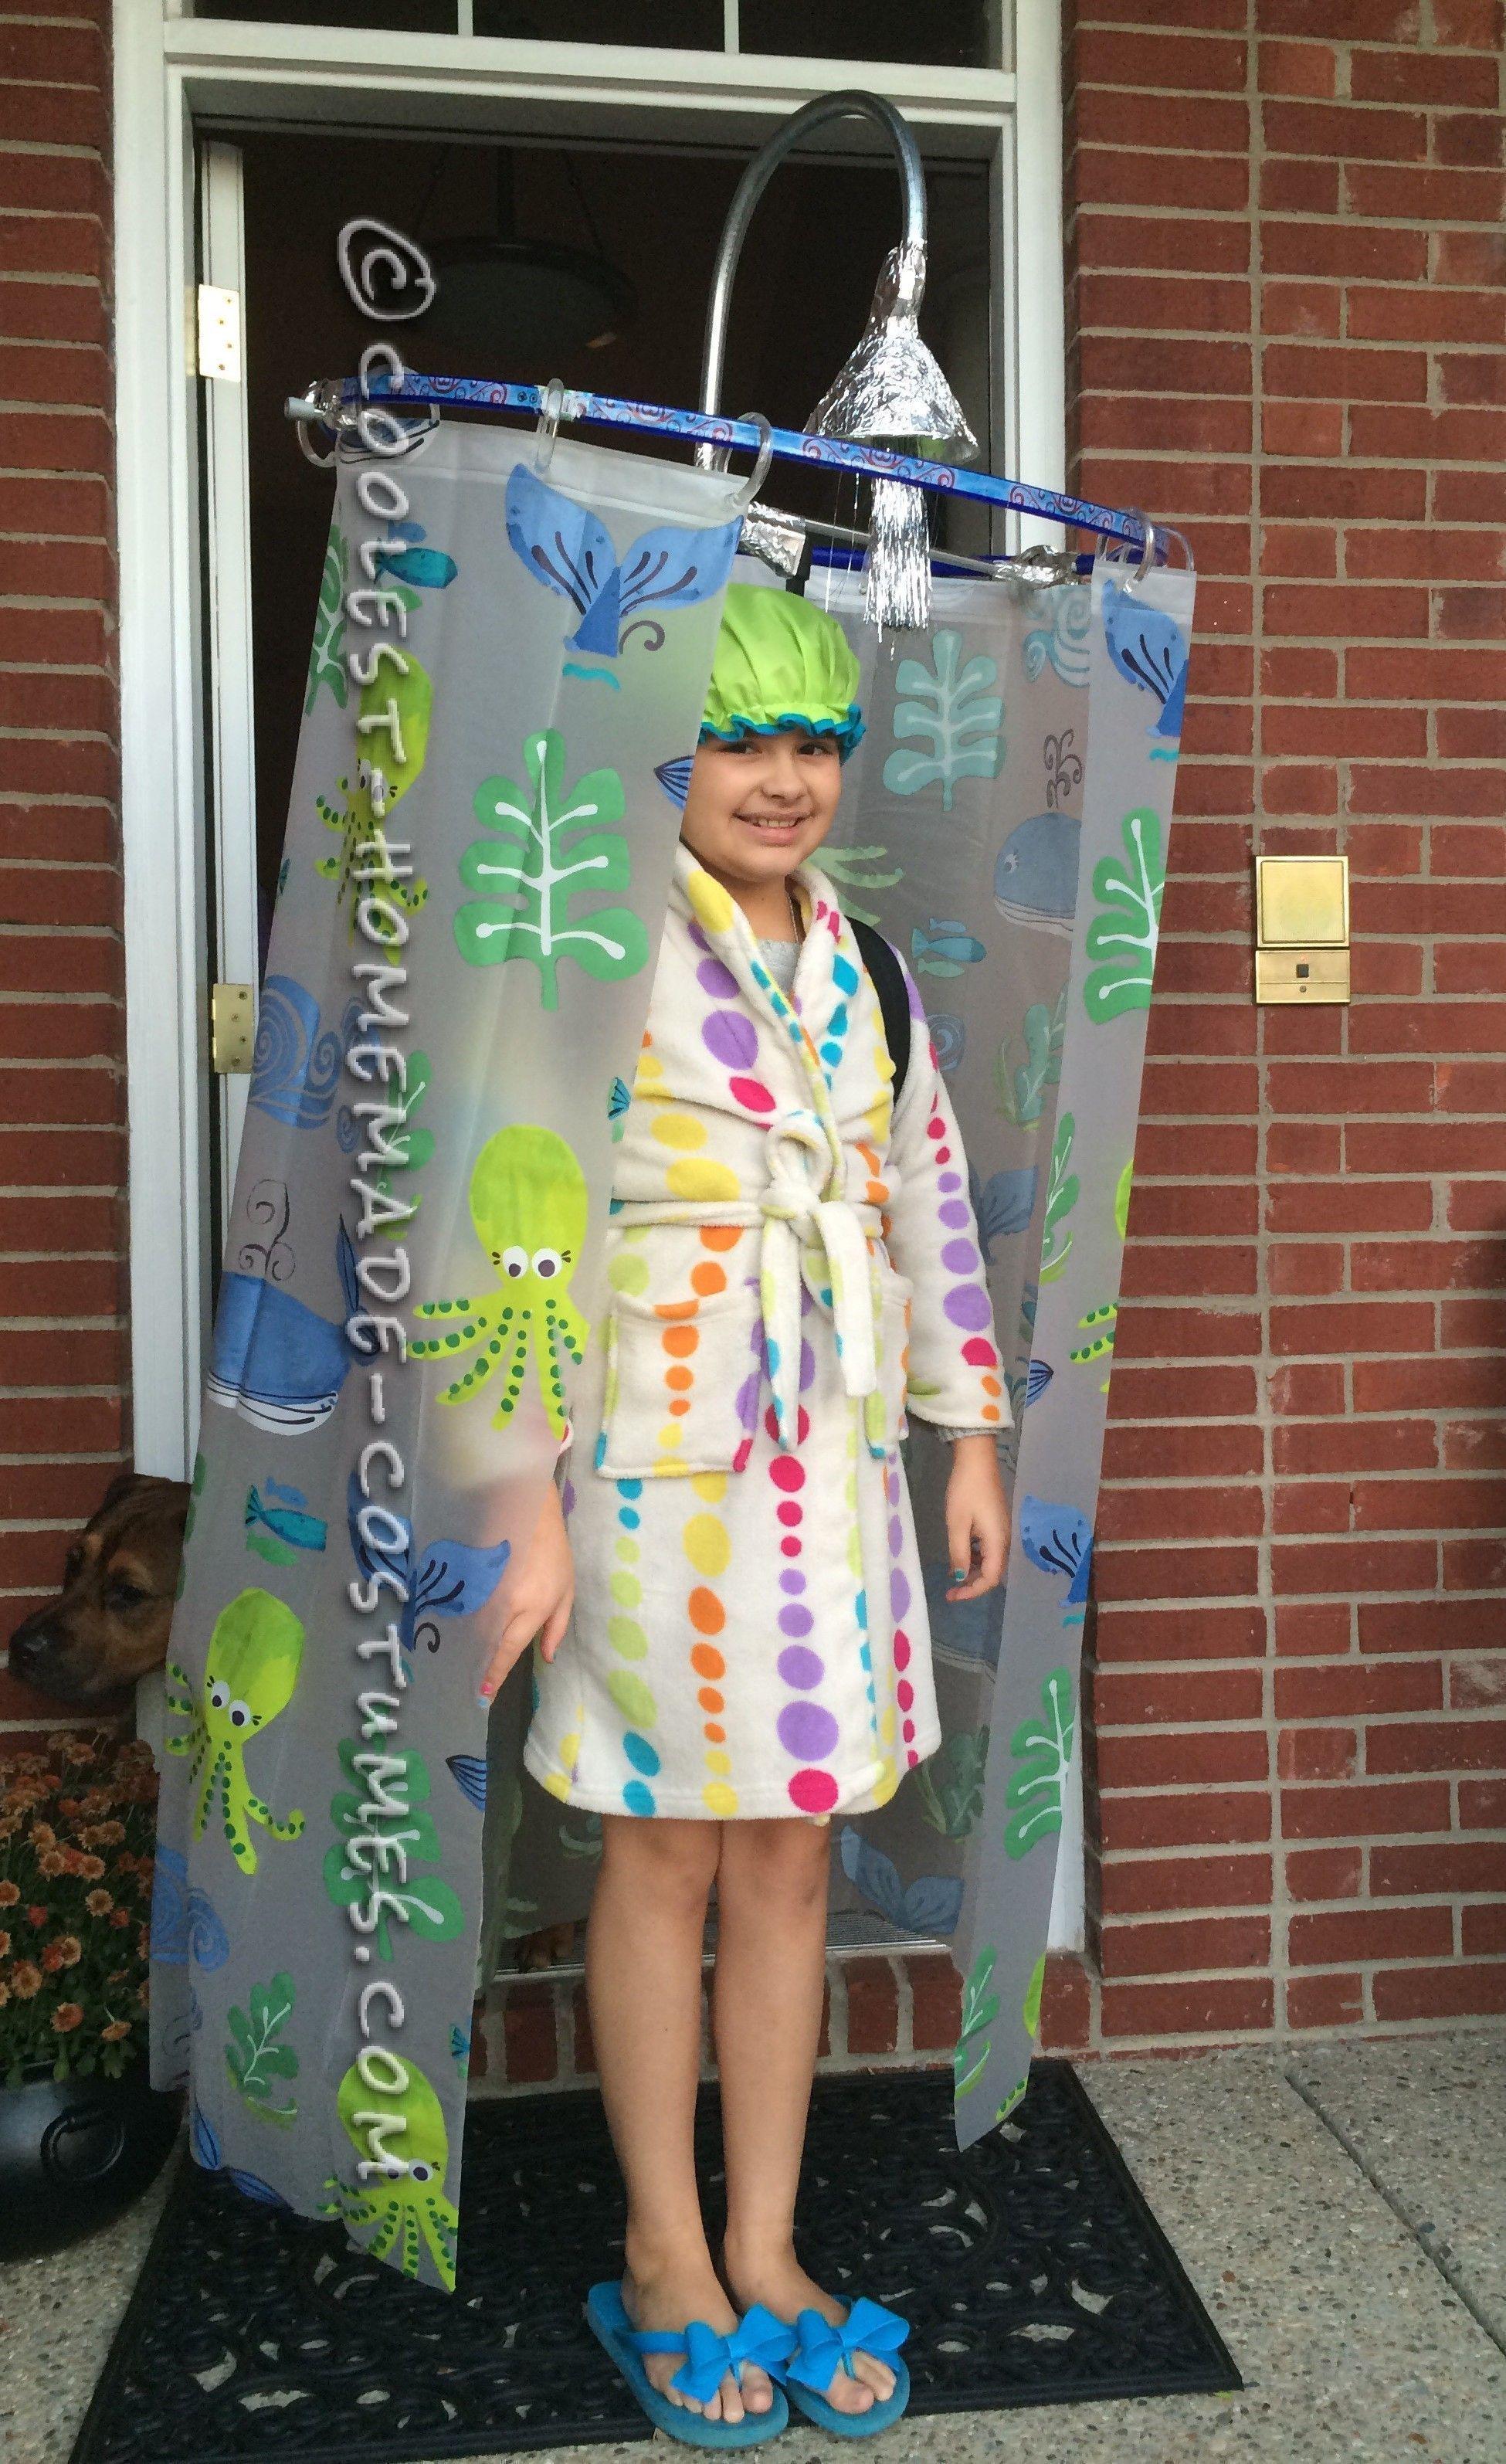 Cool DIY Costume Idea Shower Curtain Coolest Halloween Contest Coolhalloweencostumes Halloweencostumes